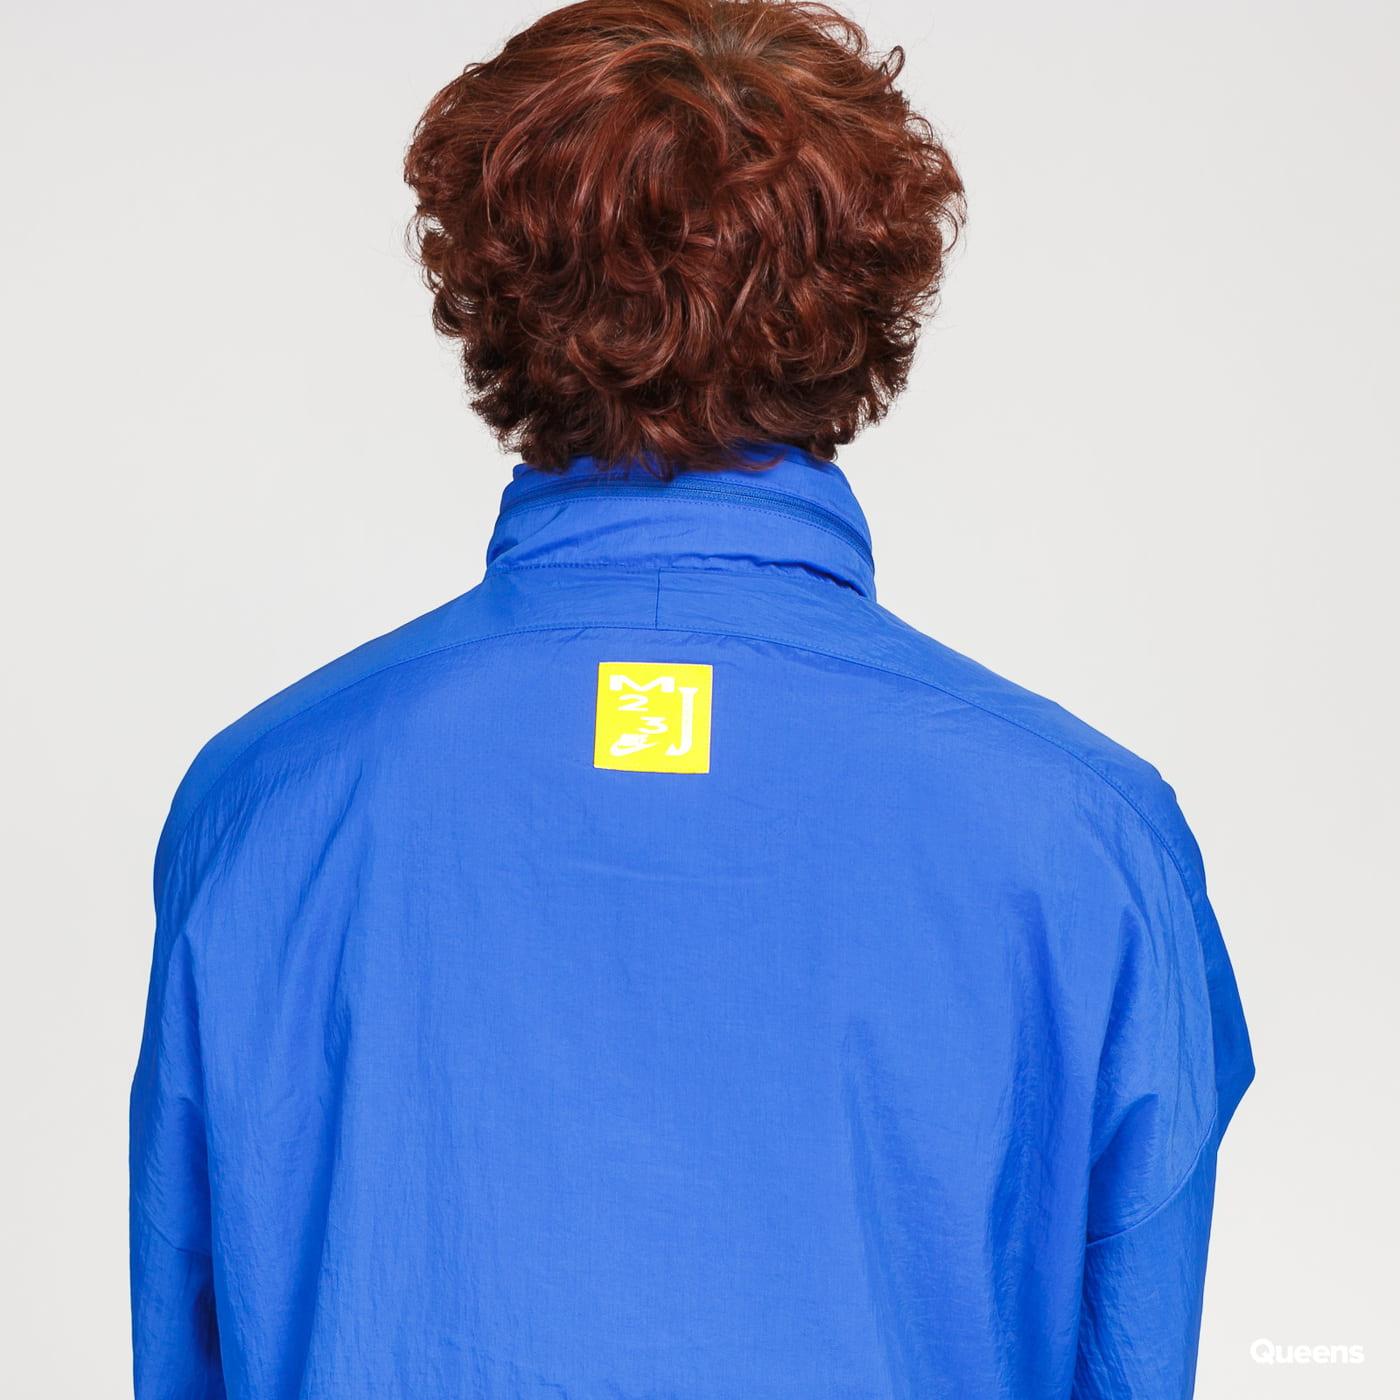 Jordan M J Sport DNA HBR Jacket dark blue